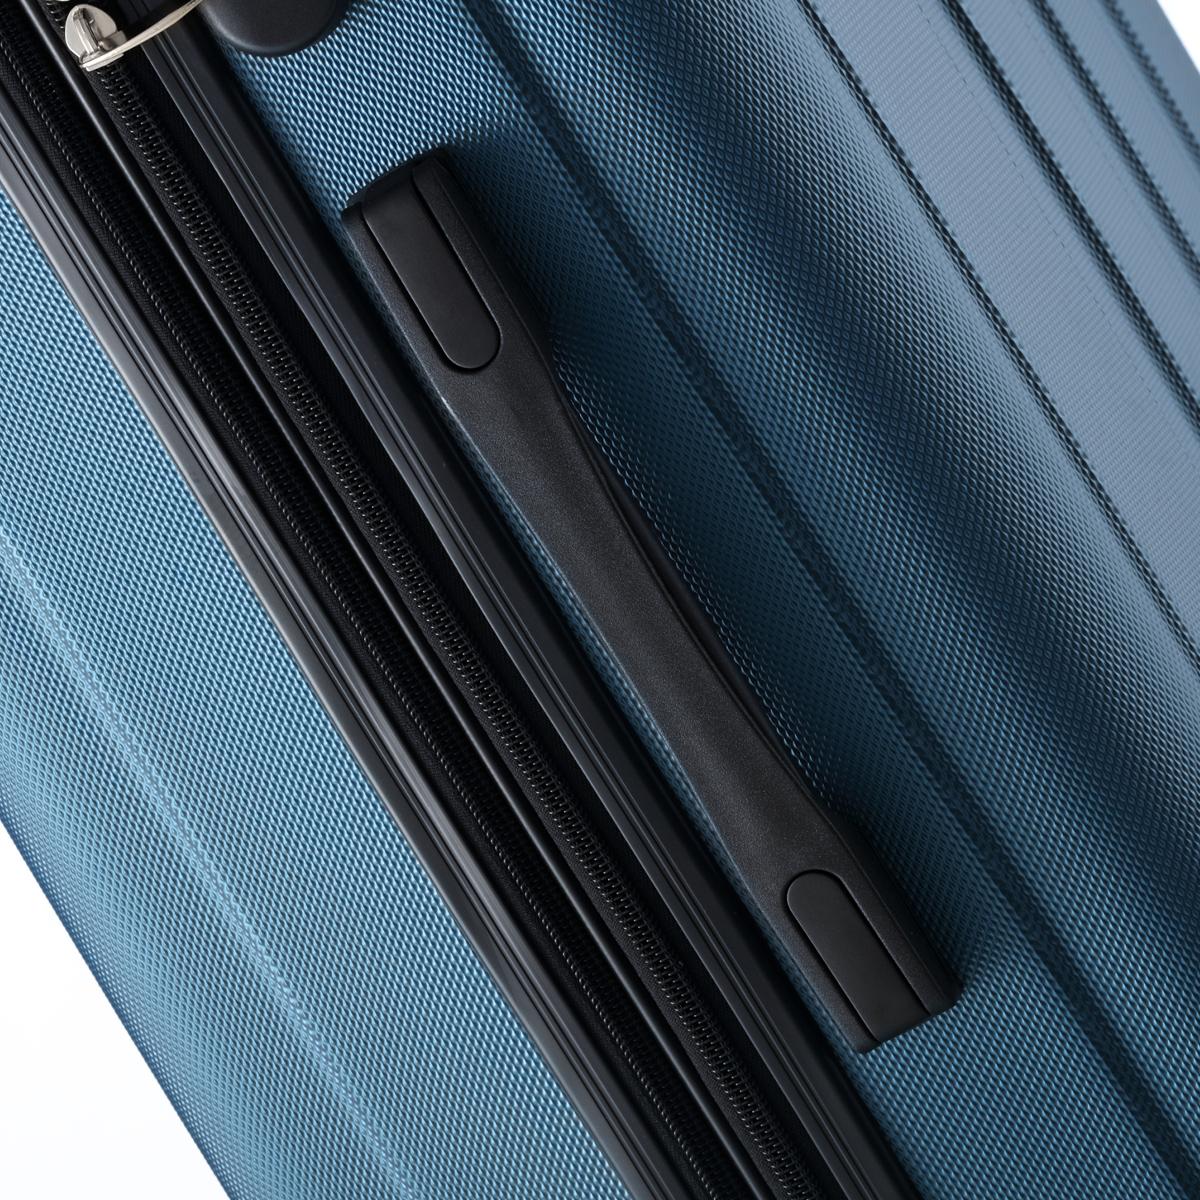 Koffer-Flexot-2045-Hartschalenkoffer-Trolley-Kofferset-Reisekoffer-M-L-XL-Set Indexbild 17